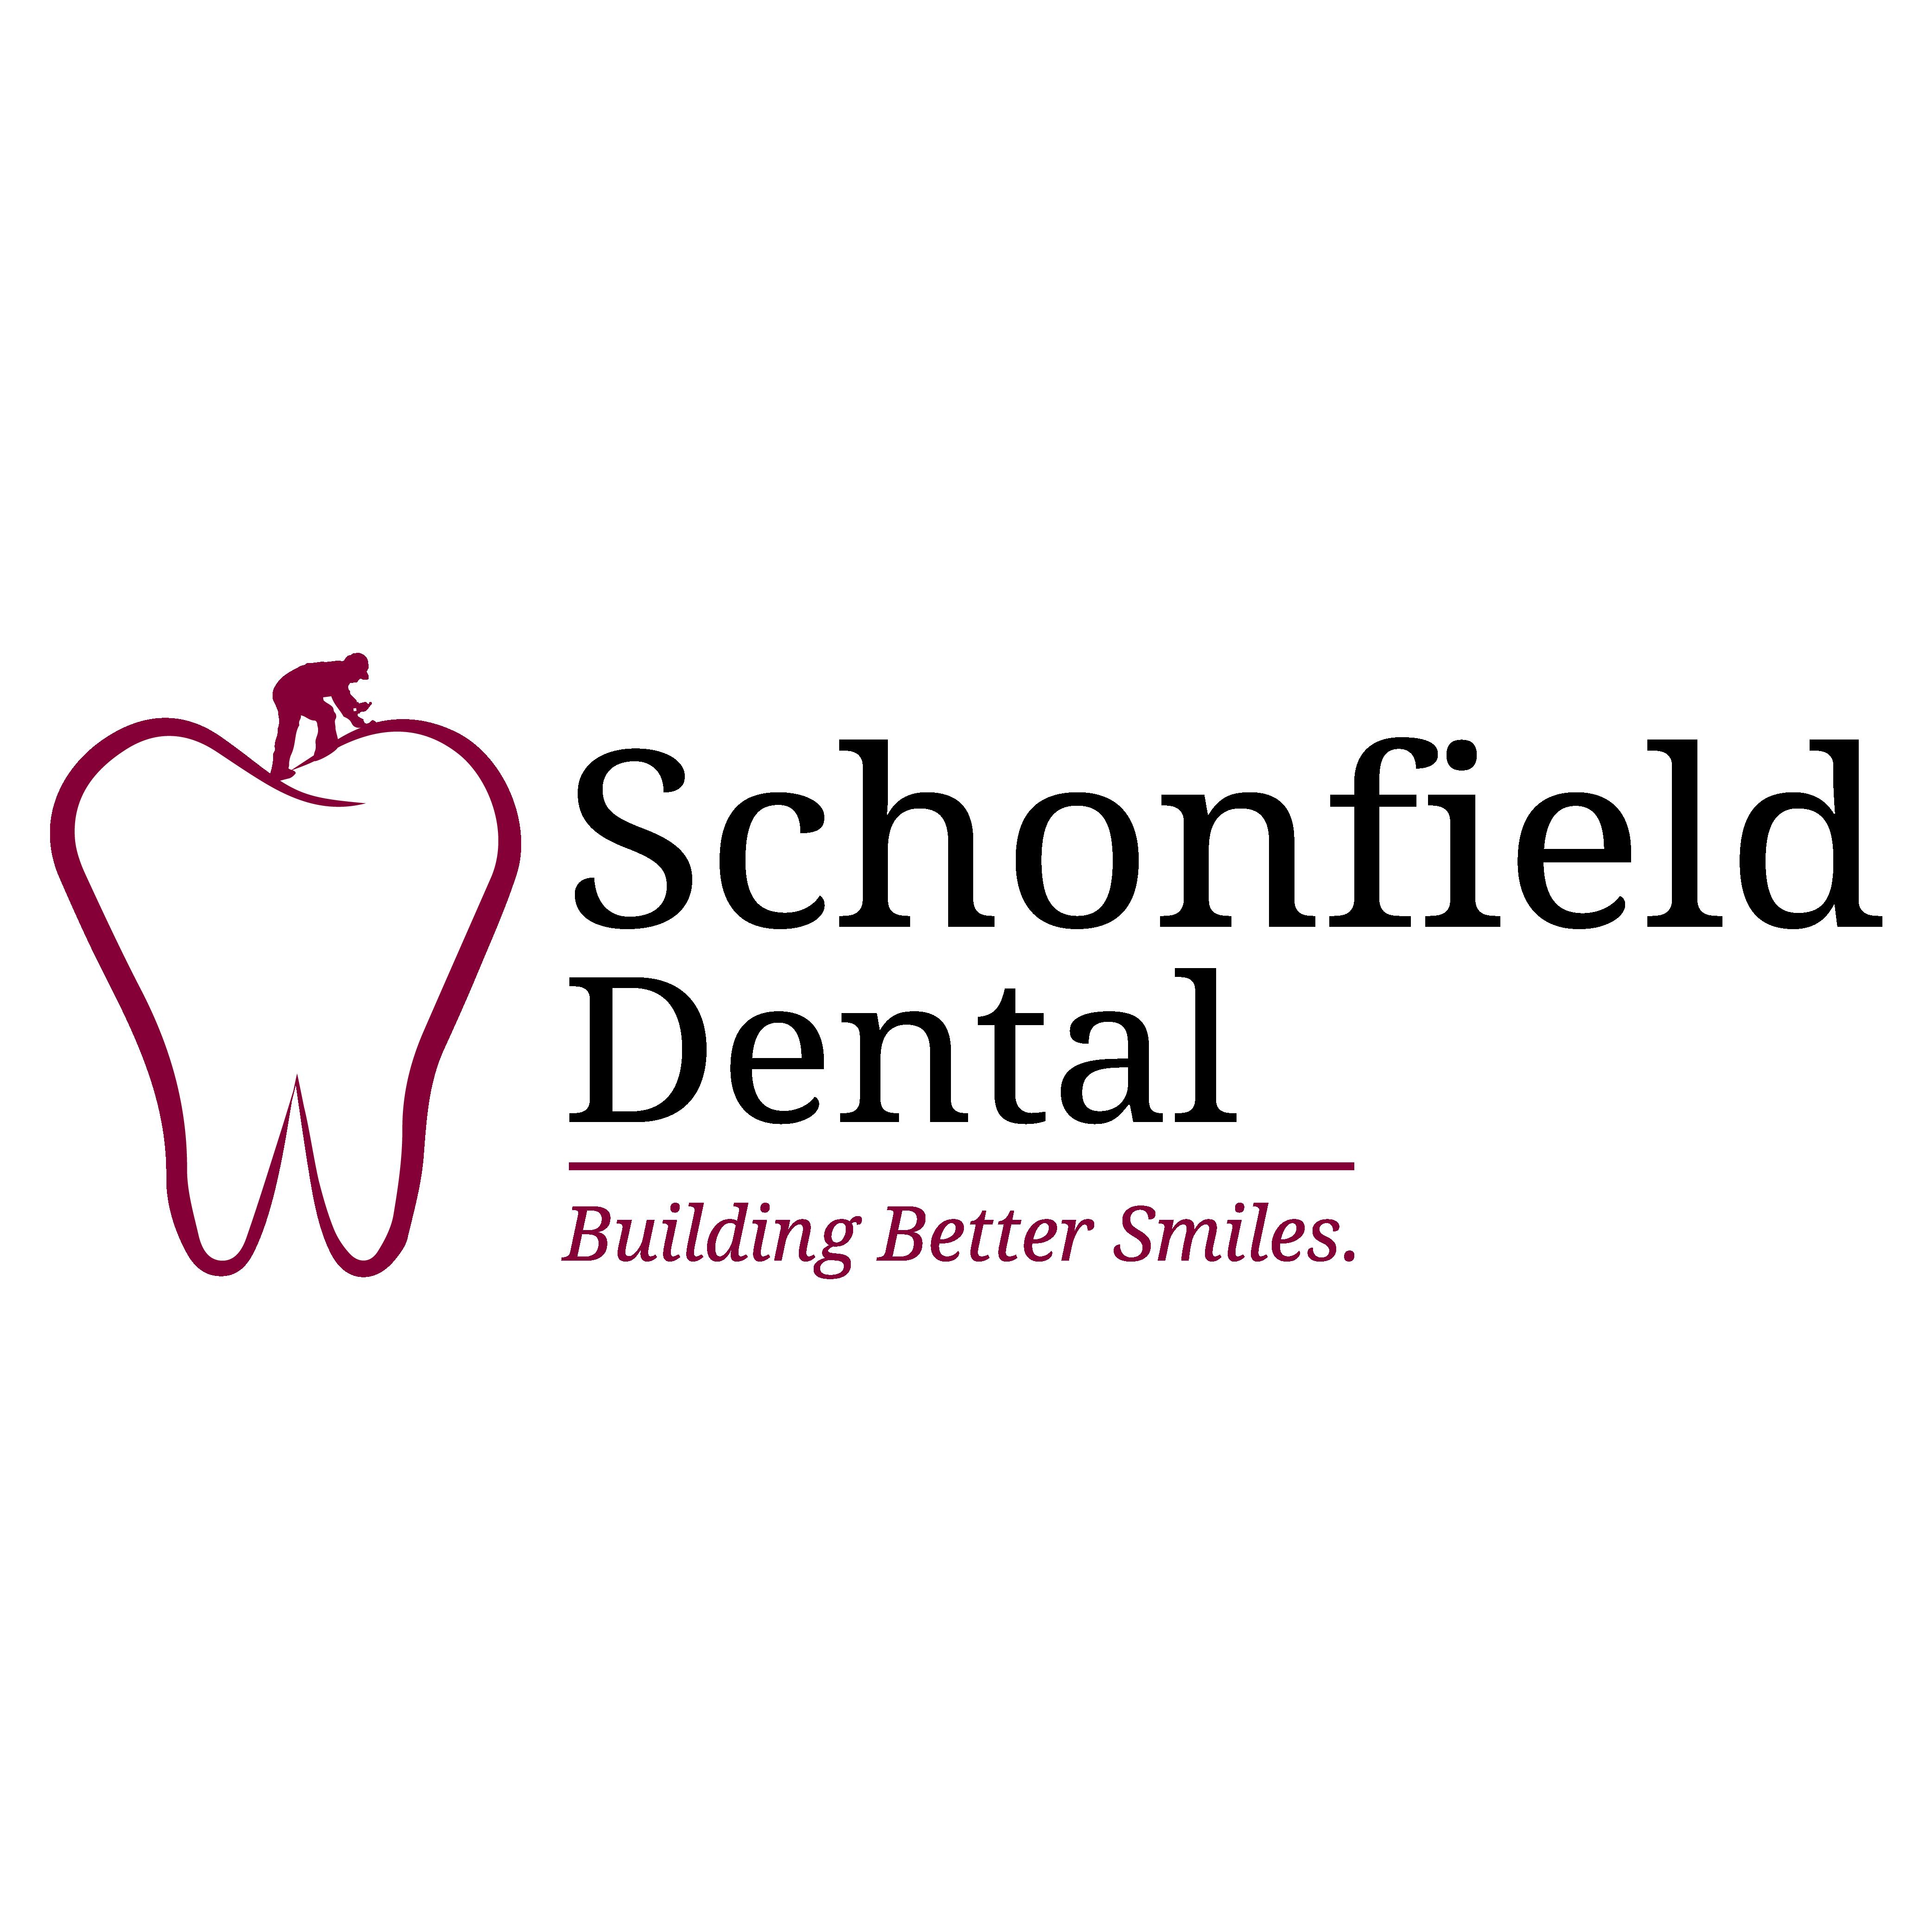 Schonfield Dental Logo